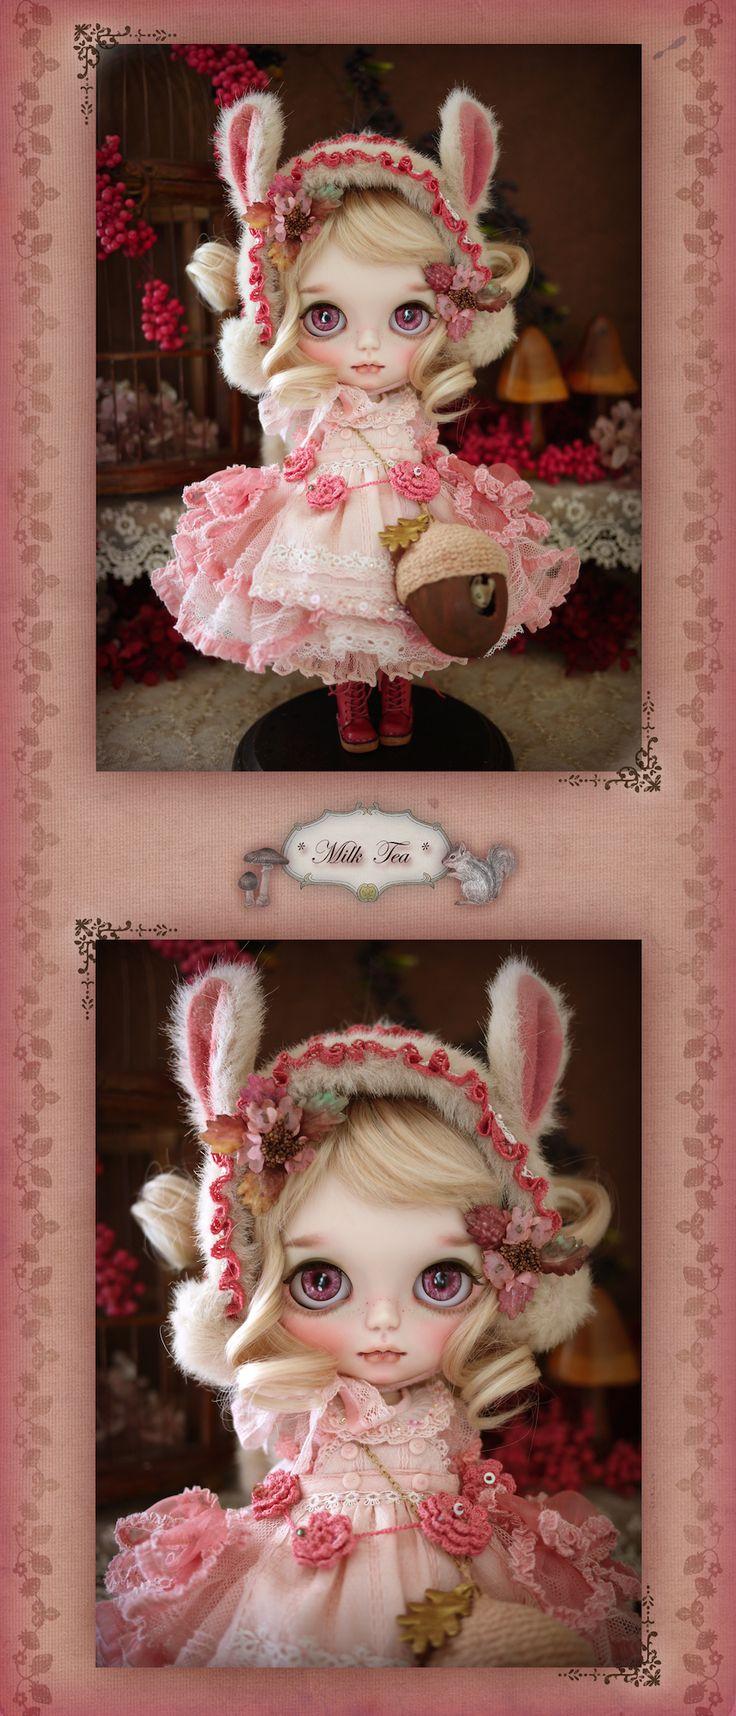 Custom Blythe Dolls: Milk Tea Custom Blythe Acorn & Squirrel - A Rinkya Blog